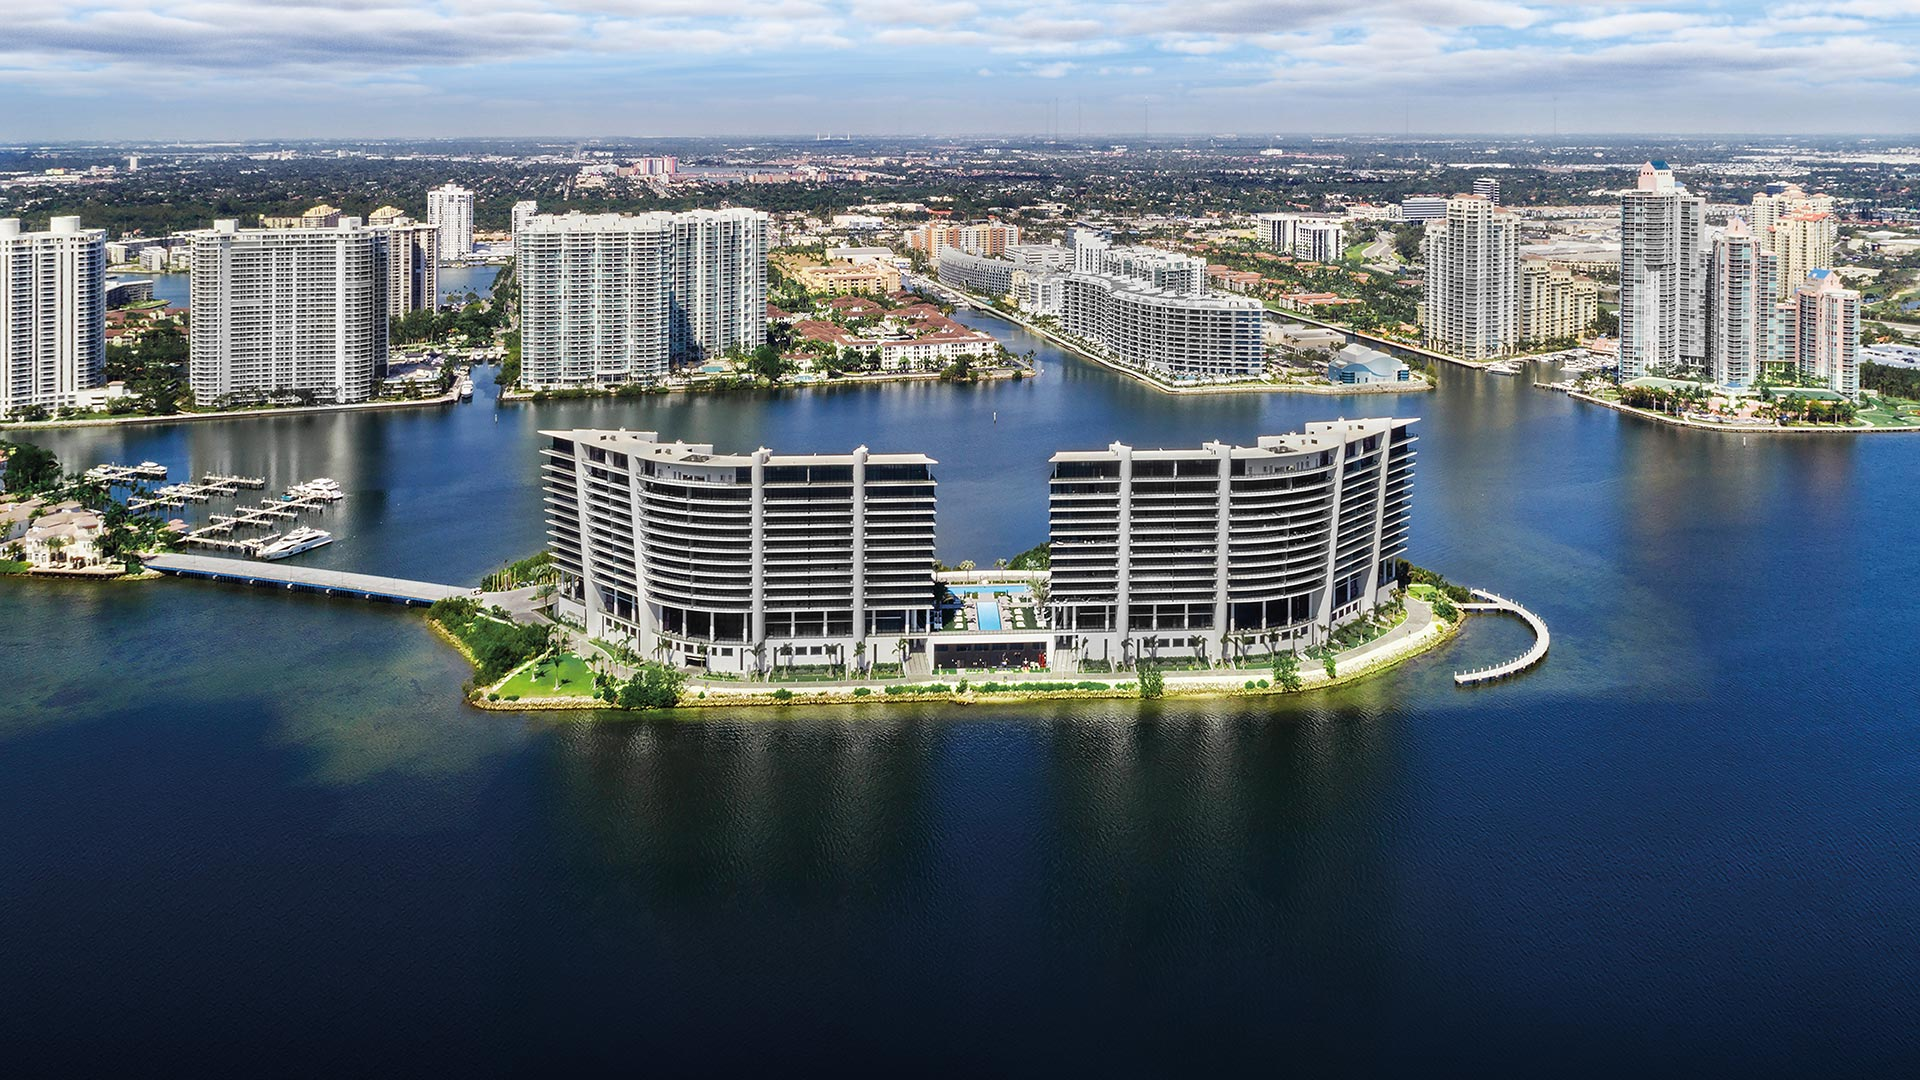 Privé Island Miami Luxury Condos